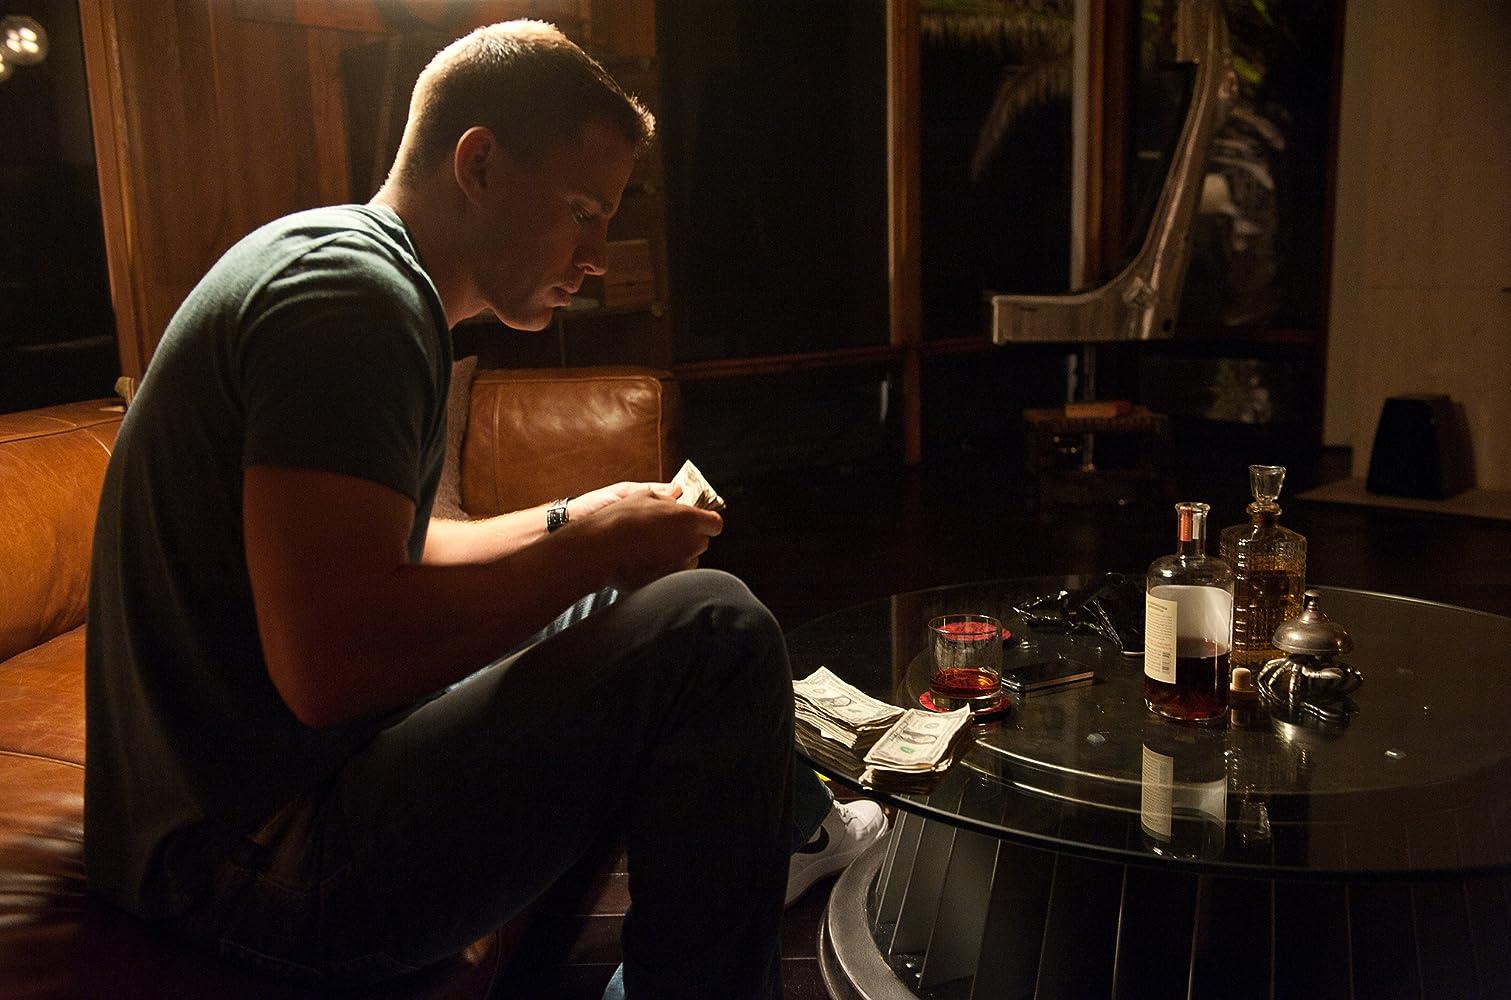 Channing Tatum in Magic Mike (2012)